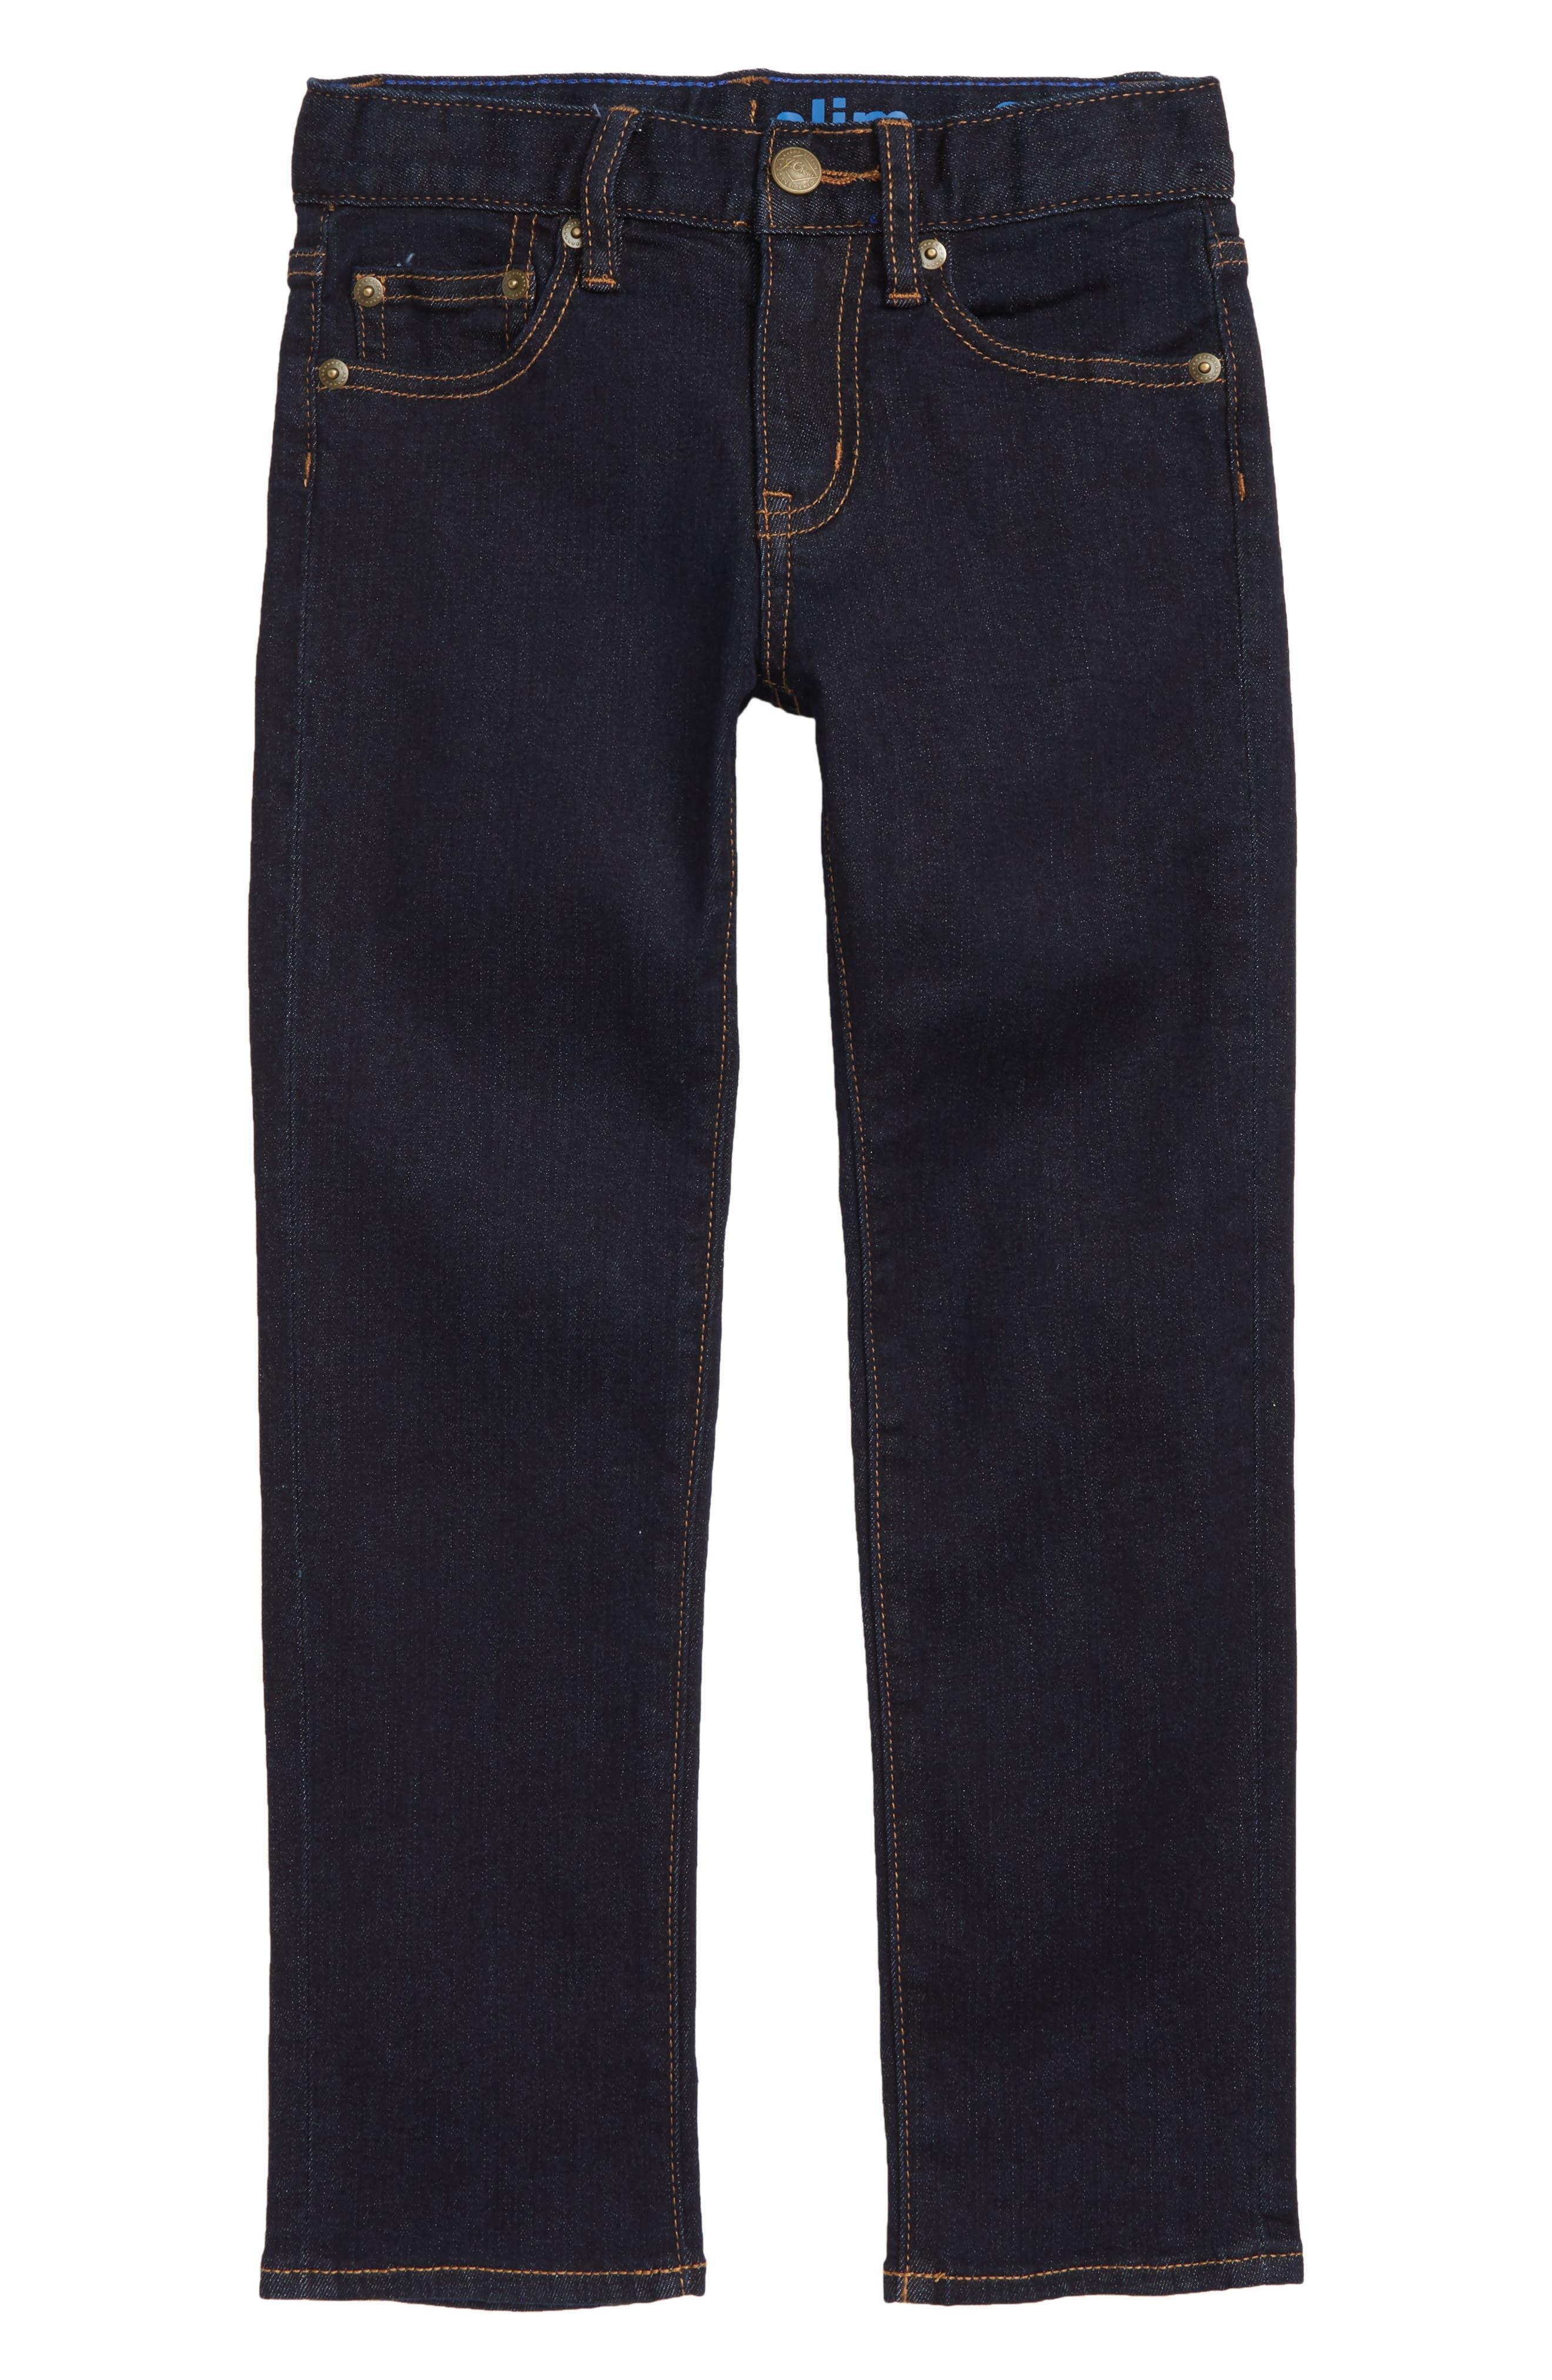 Runaround Slim Jeans,                         Main,                         color, 400